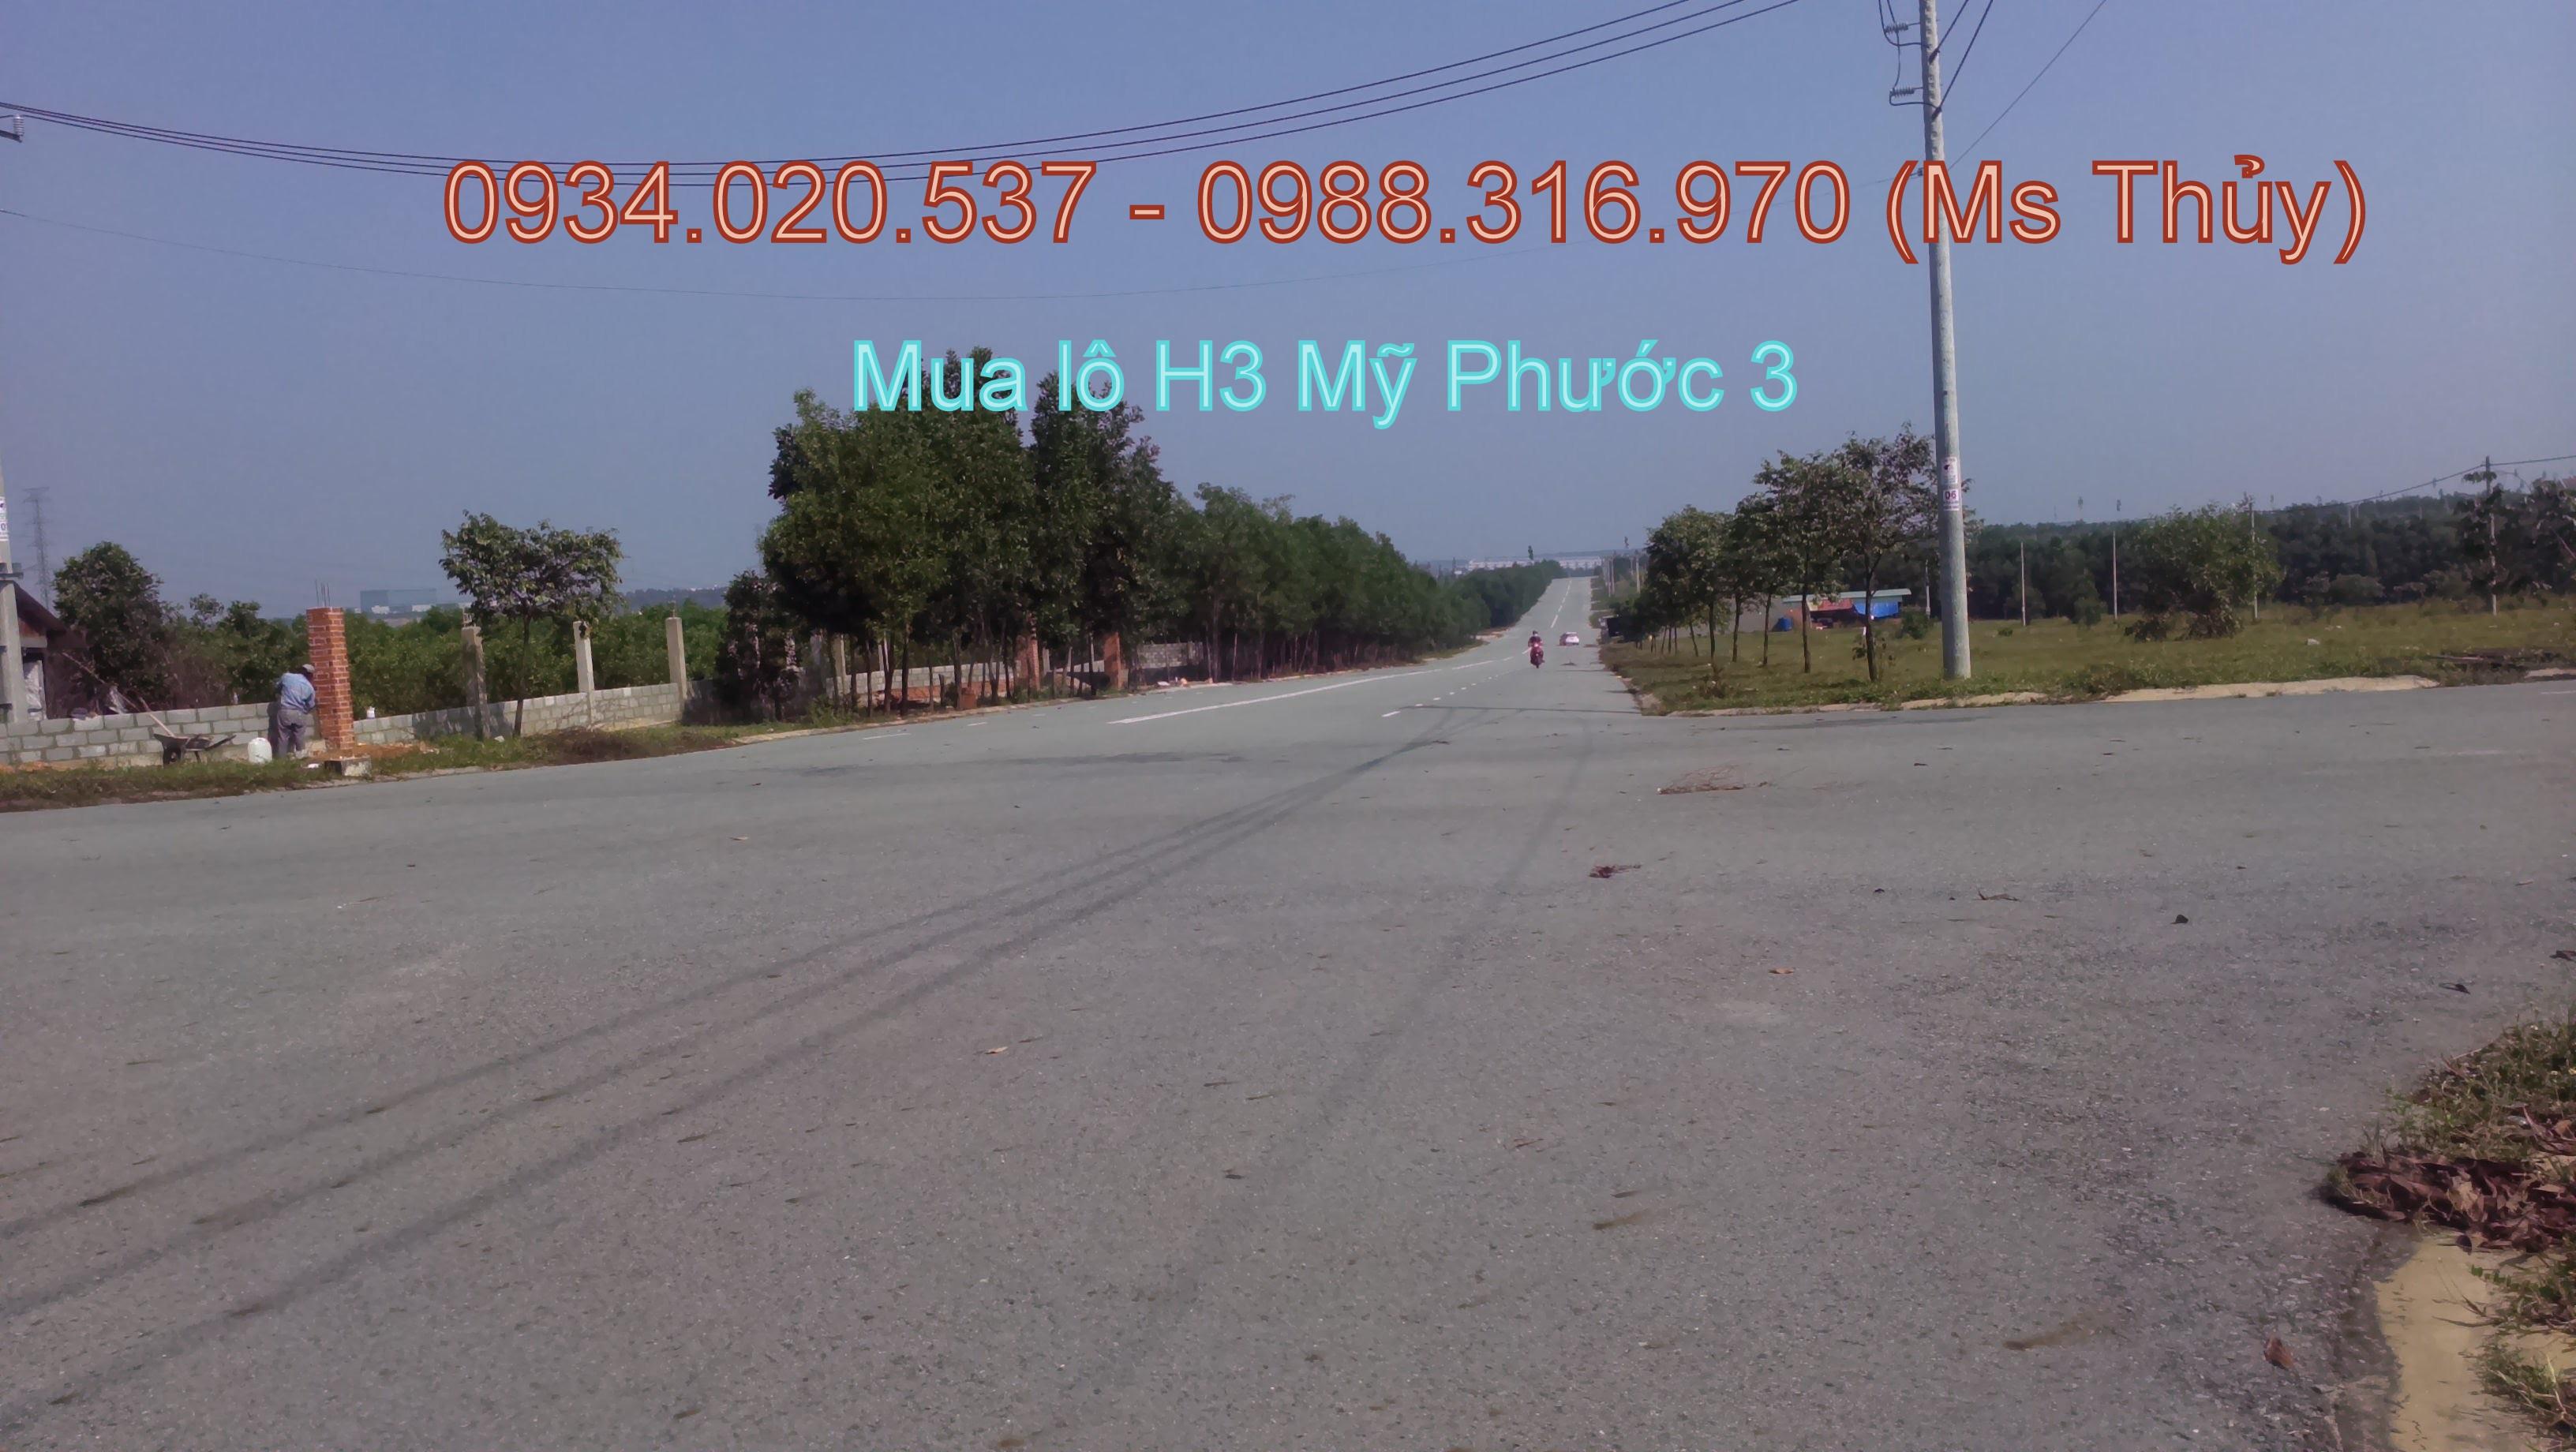 lo h3 my phuoc 3